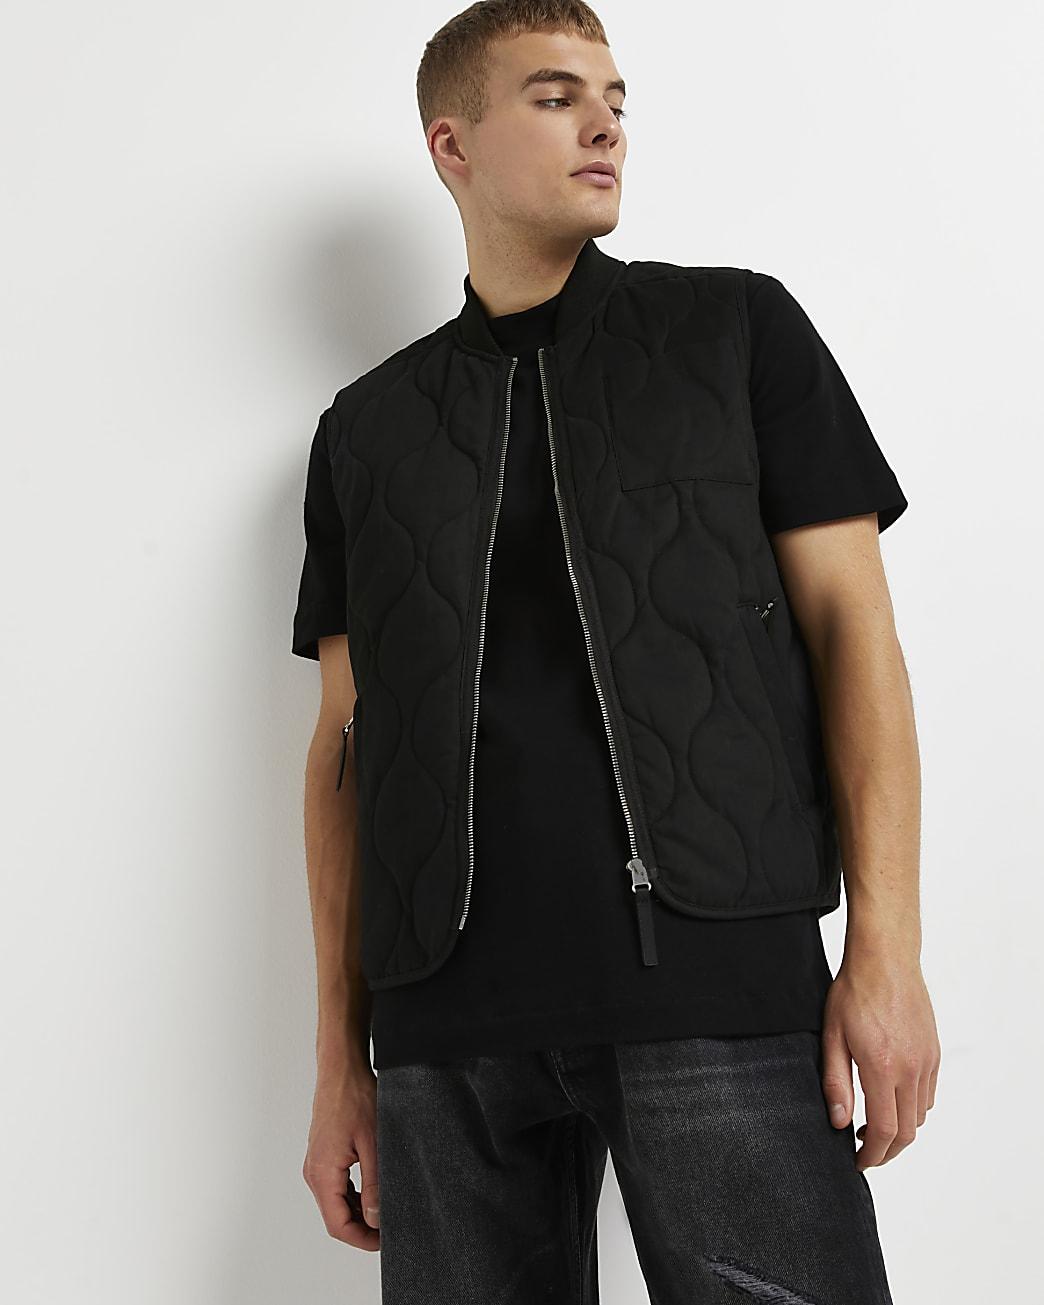 Black quilted zip pocket gilet